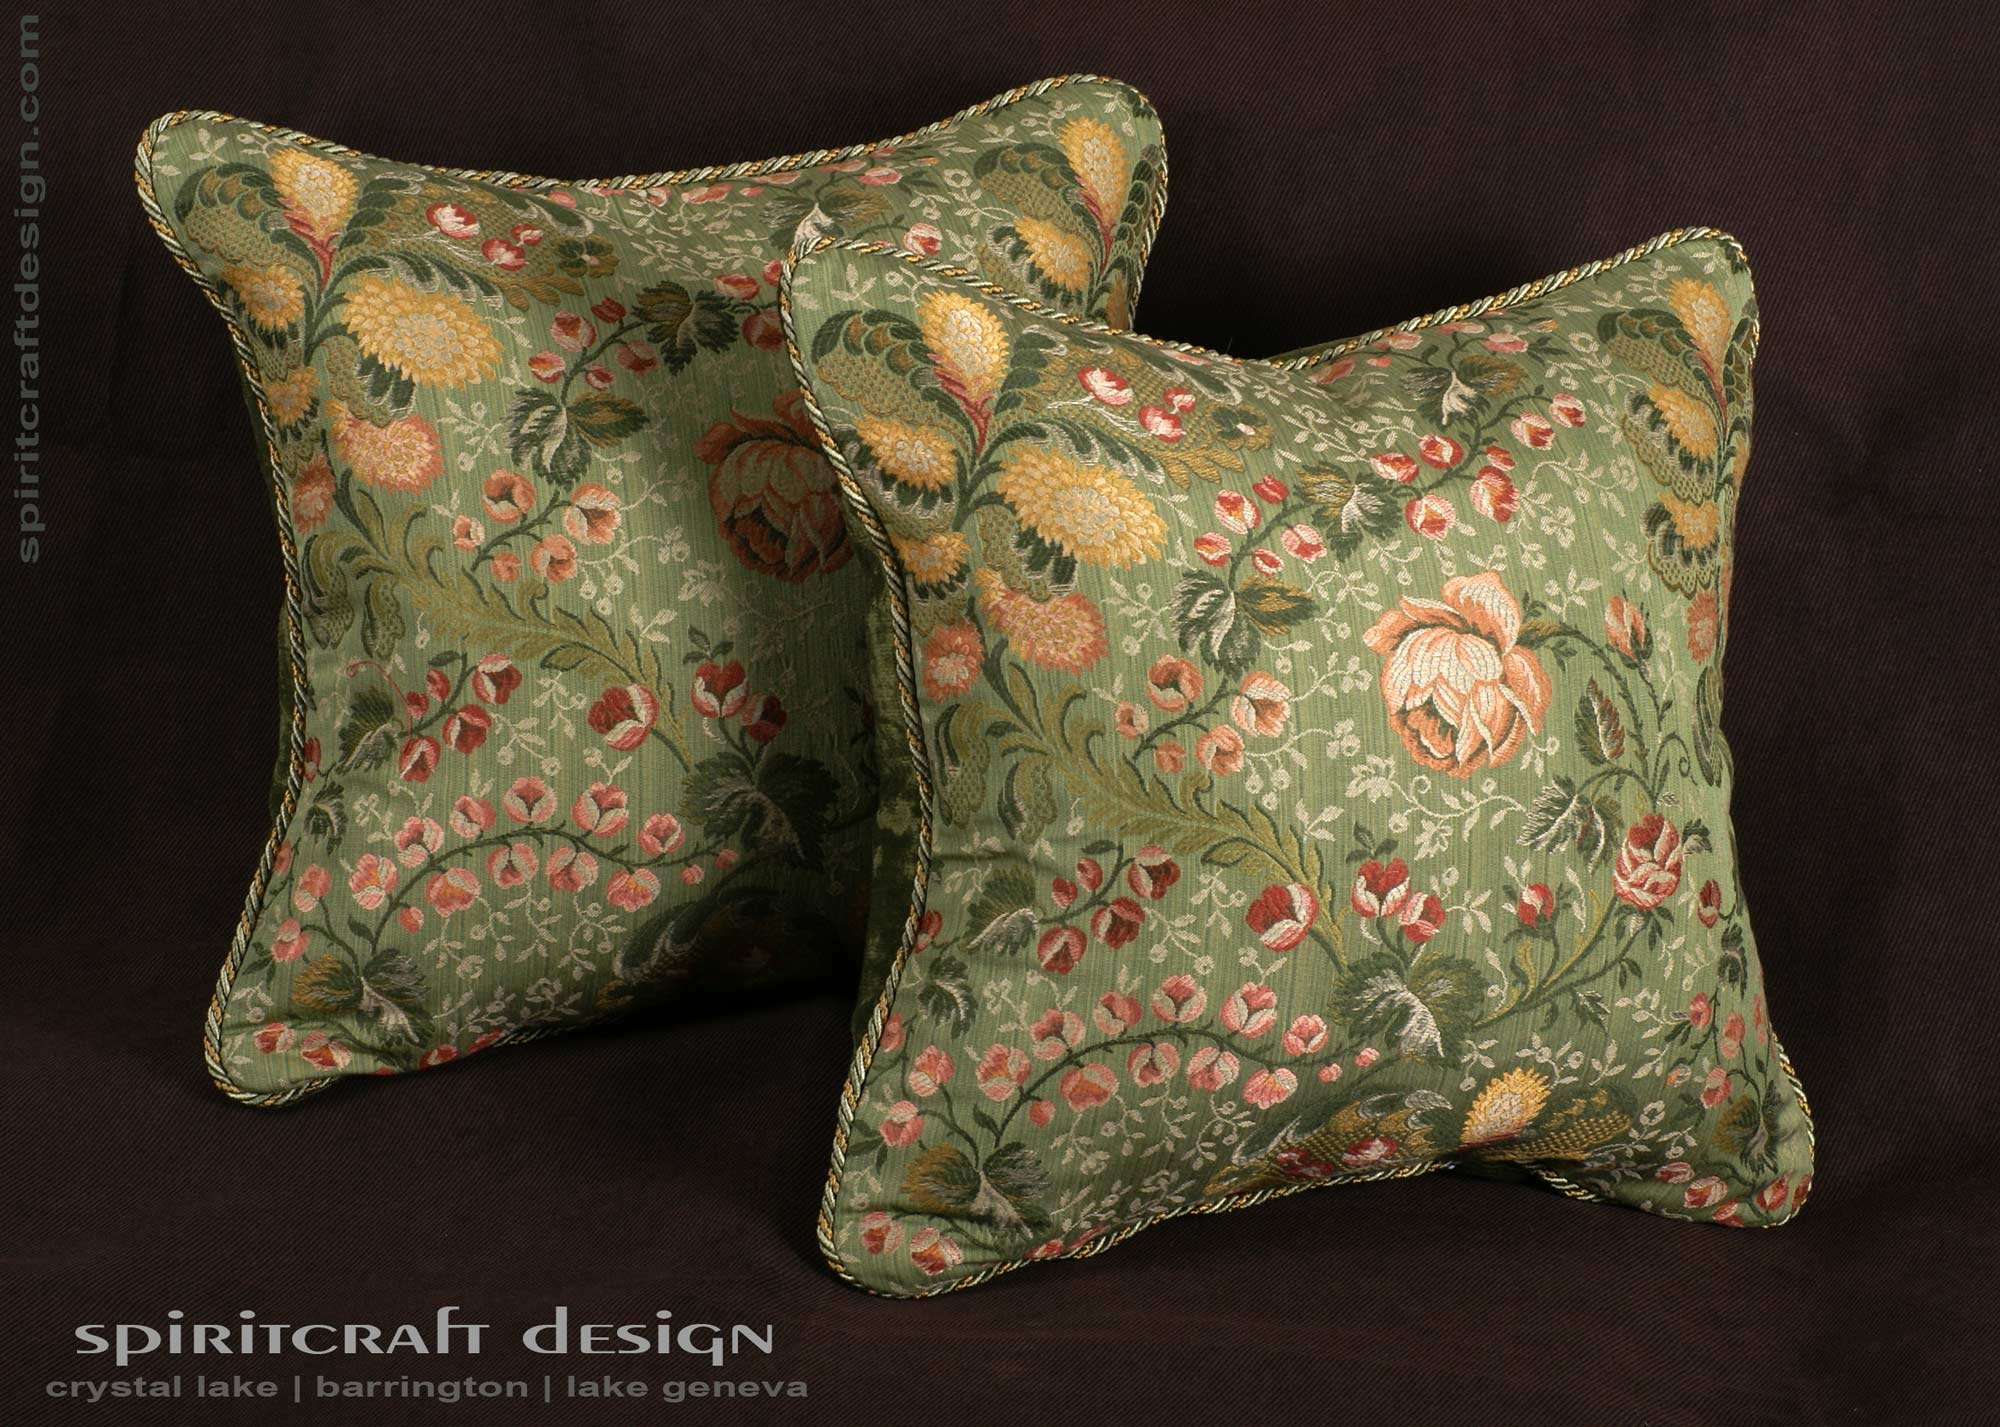 luxury sofa throw pillows kuka hong kong designer for decorative